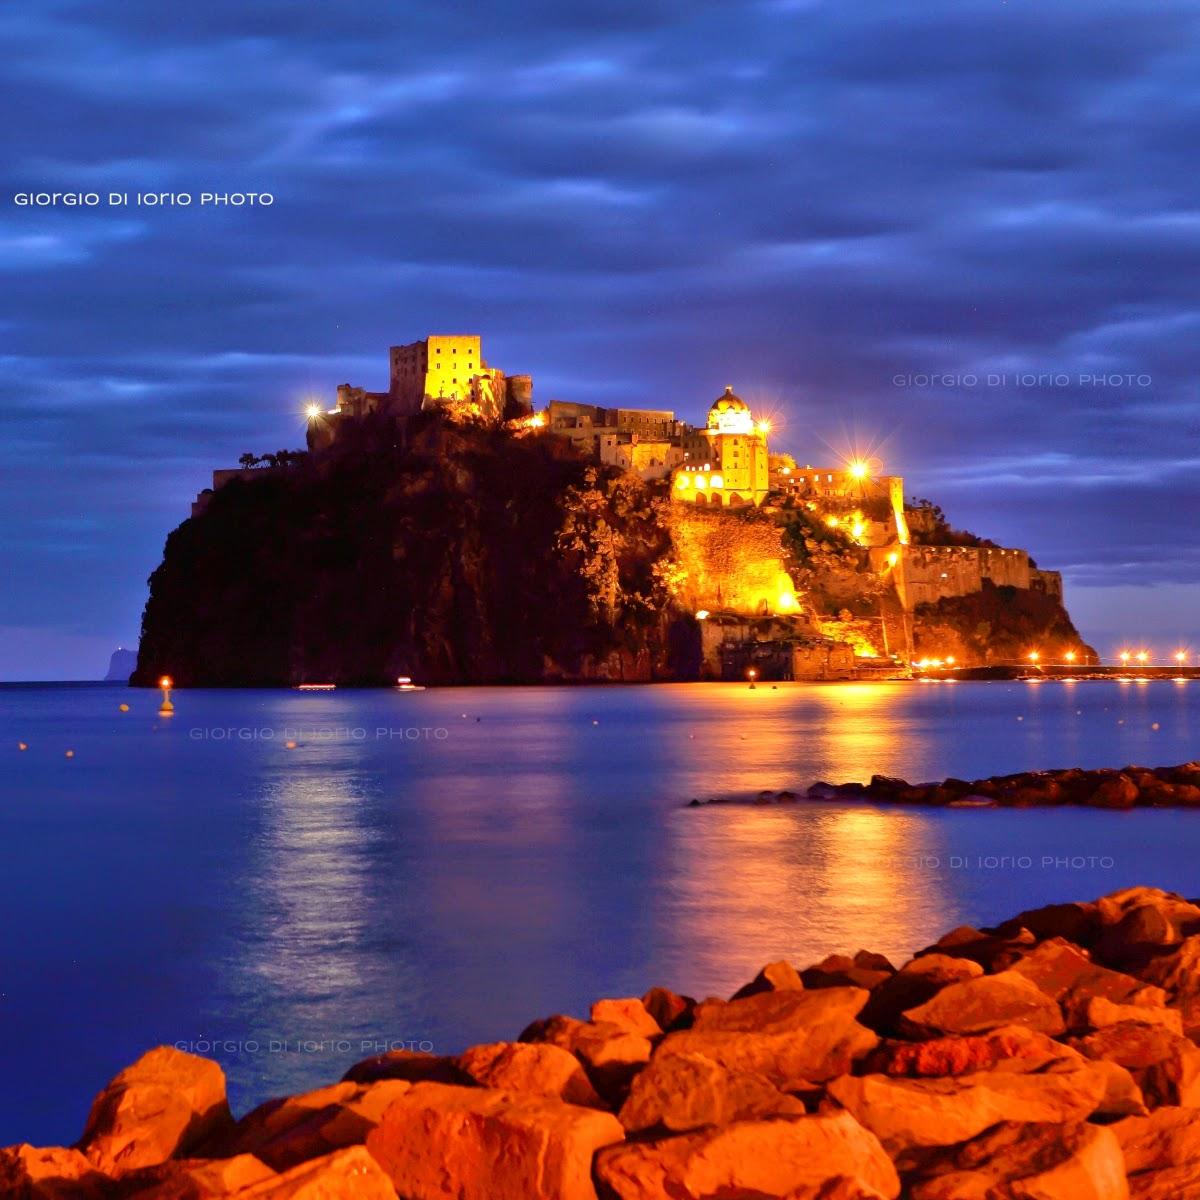 Ischia di notte - Verso sera